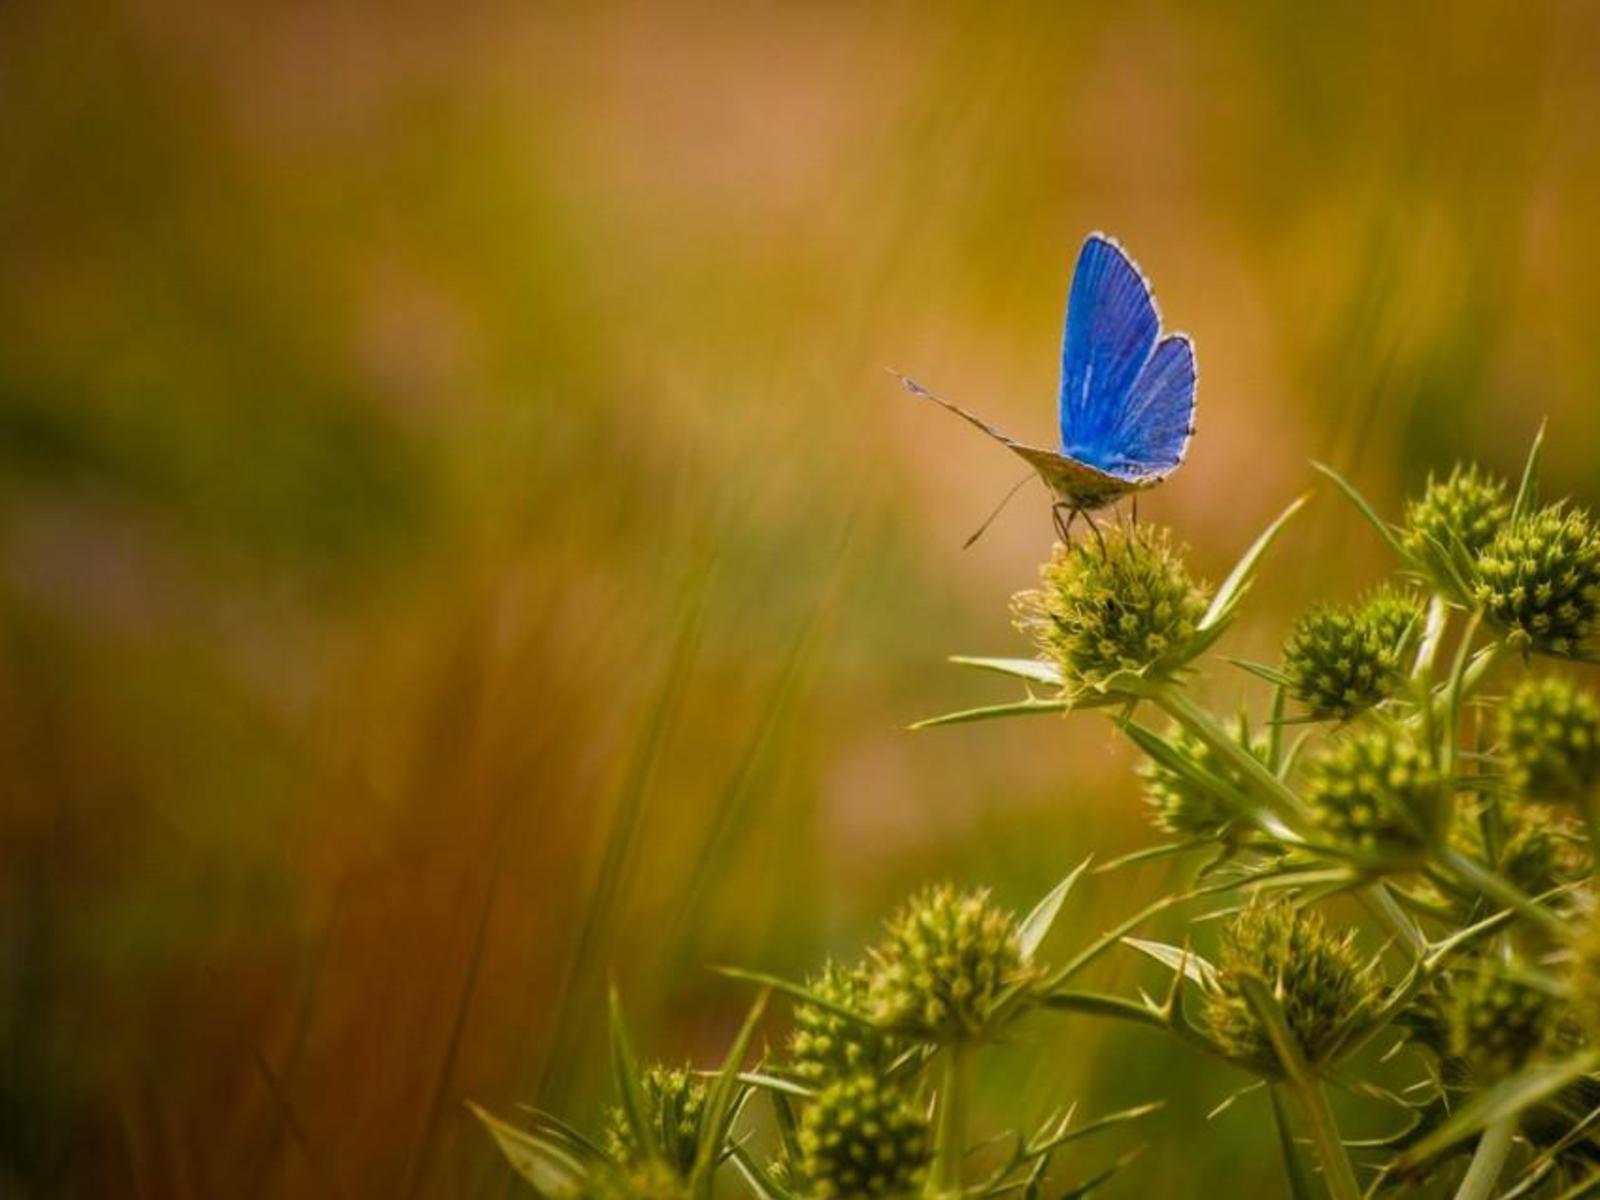 Beautiful तितलियों